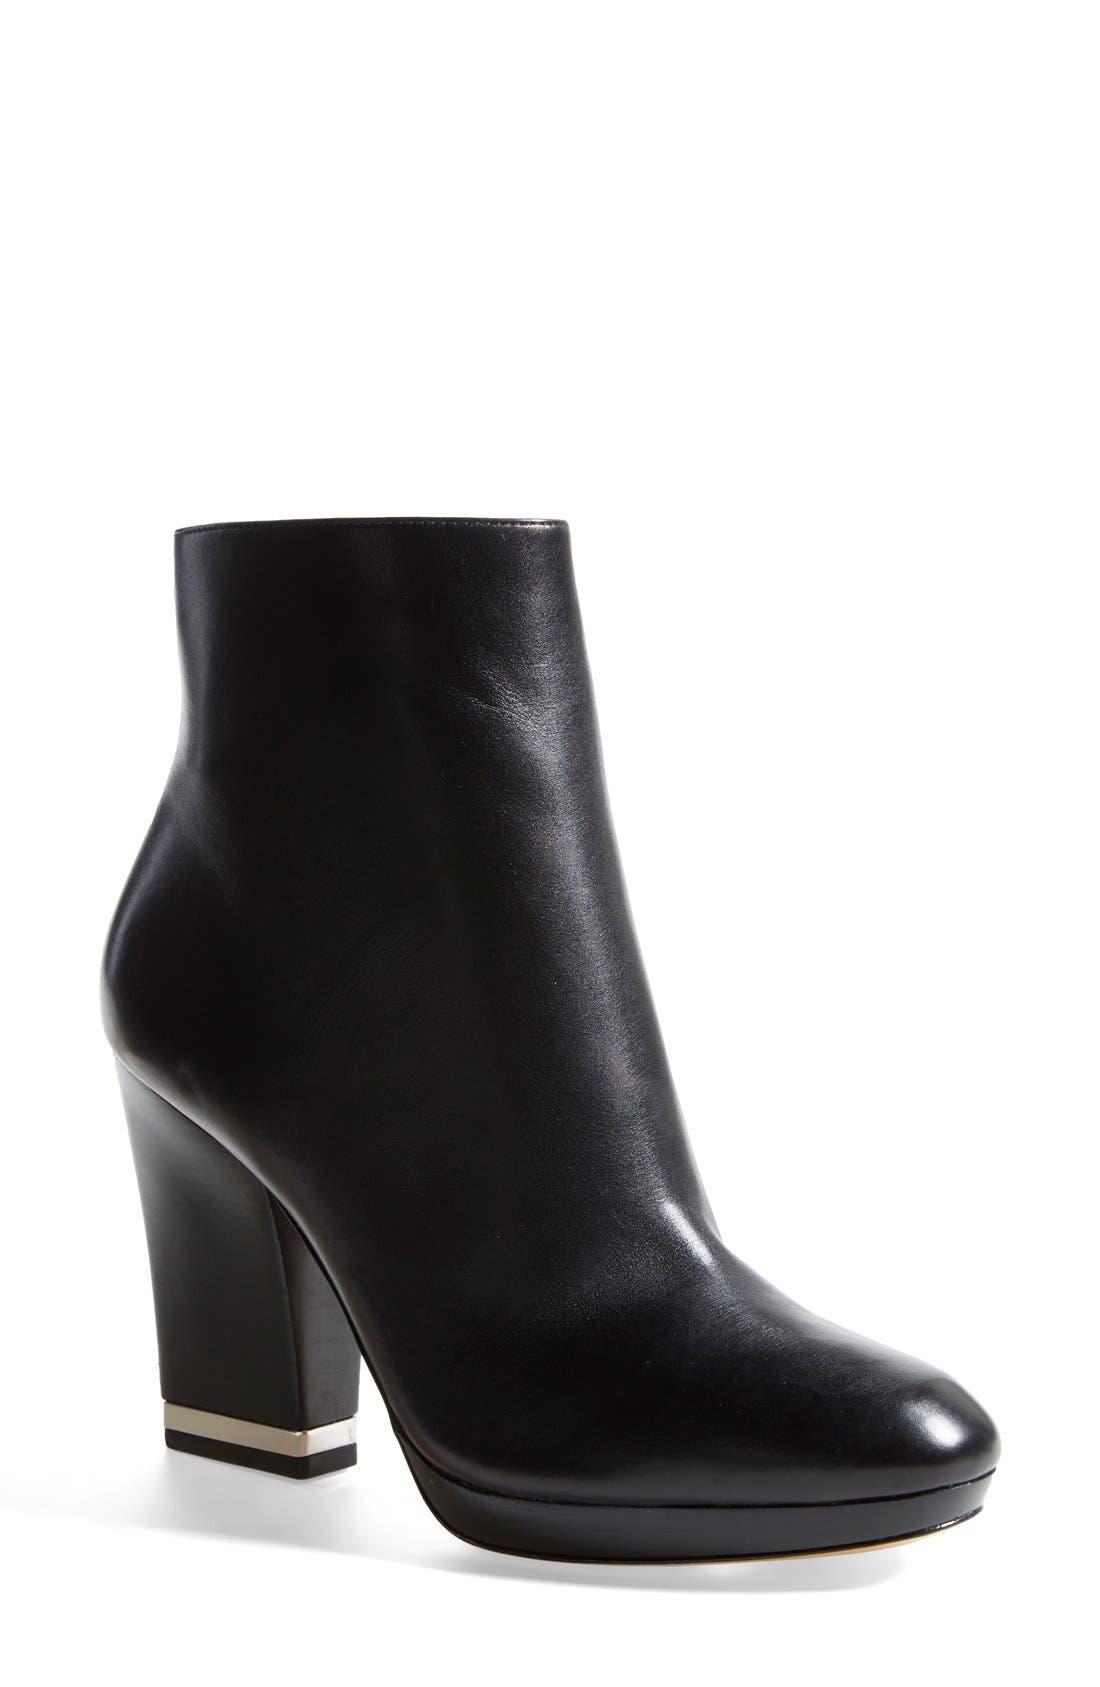 Alternate Image 1 Selected - Michael Kors 'Catherine' Calfskin Leather Almond Toe Bootie (Women)